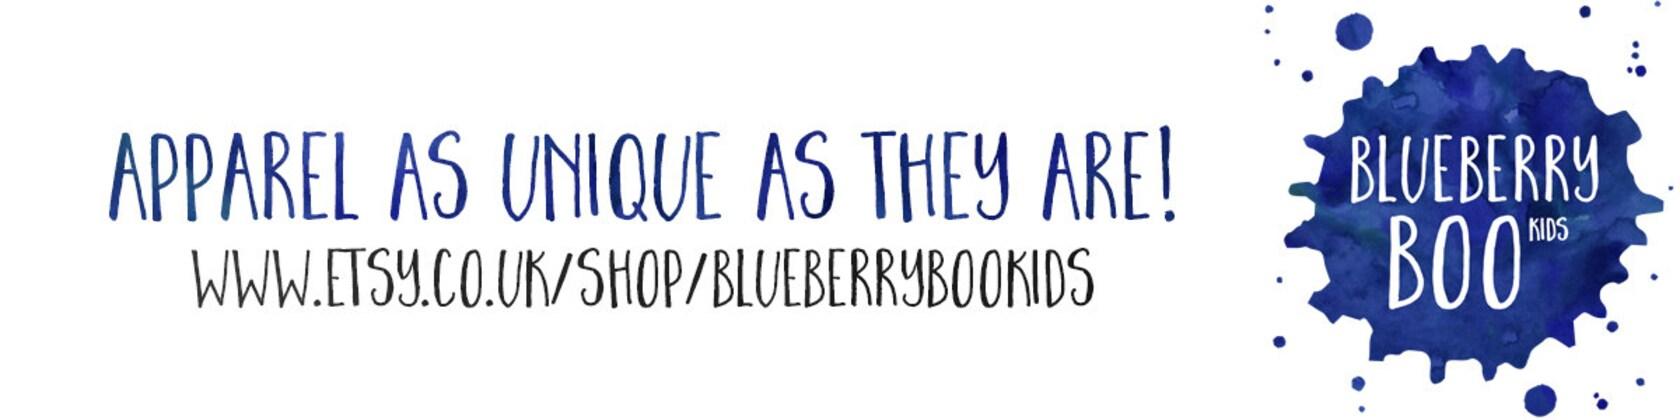 a30178e8b Blueberry Boo Kids by BlueberryBooKids on Etsy